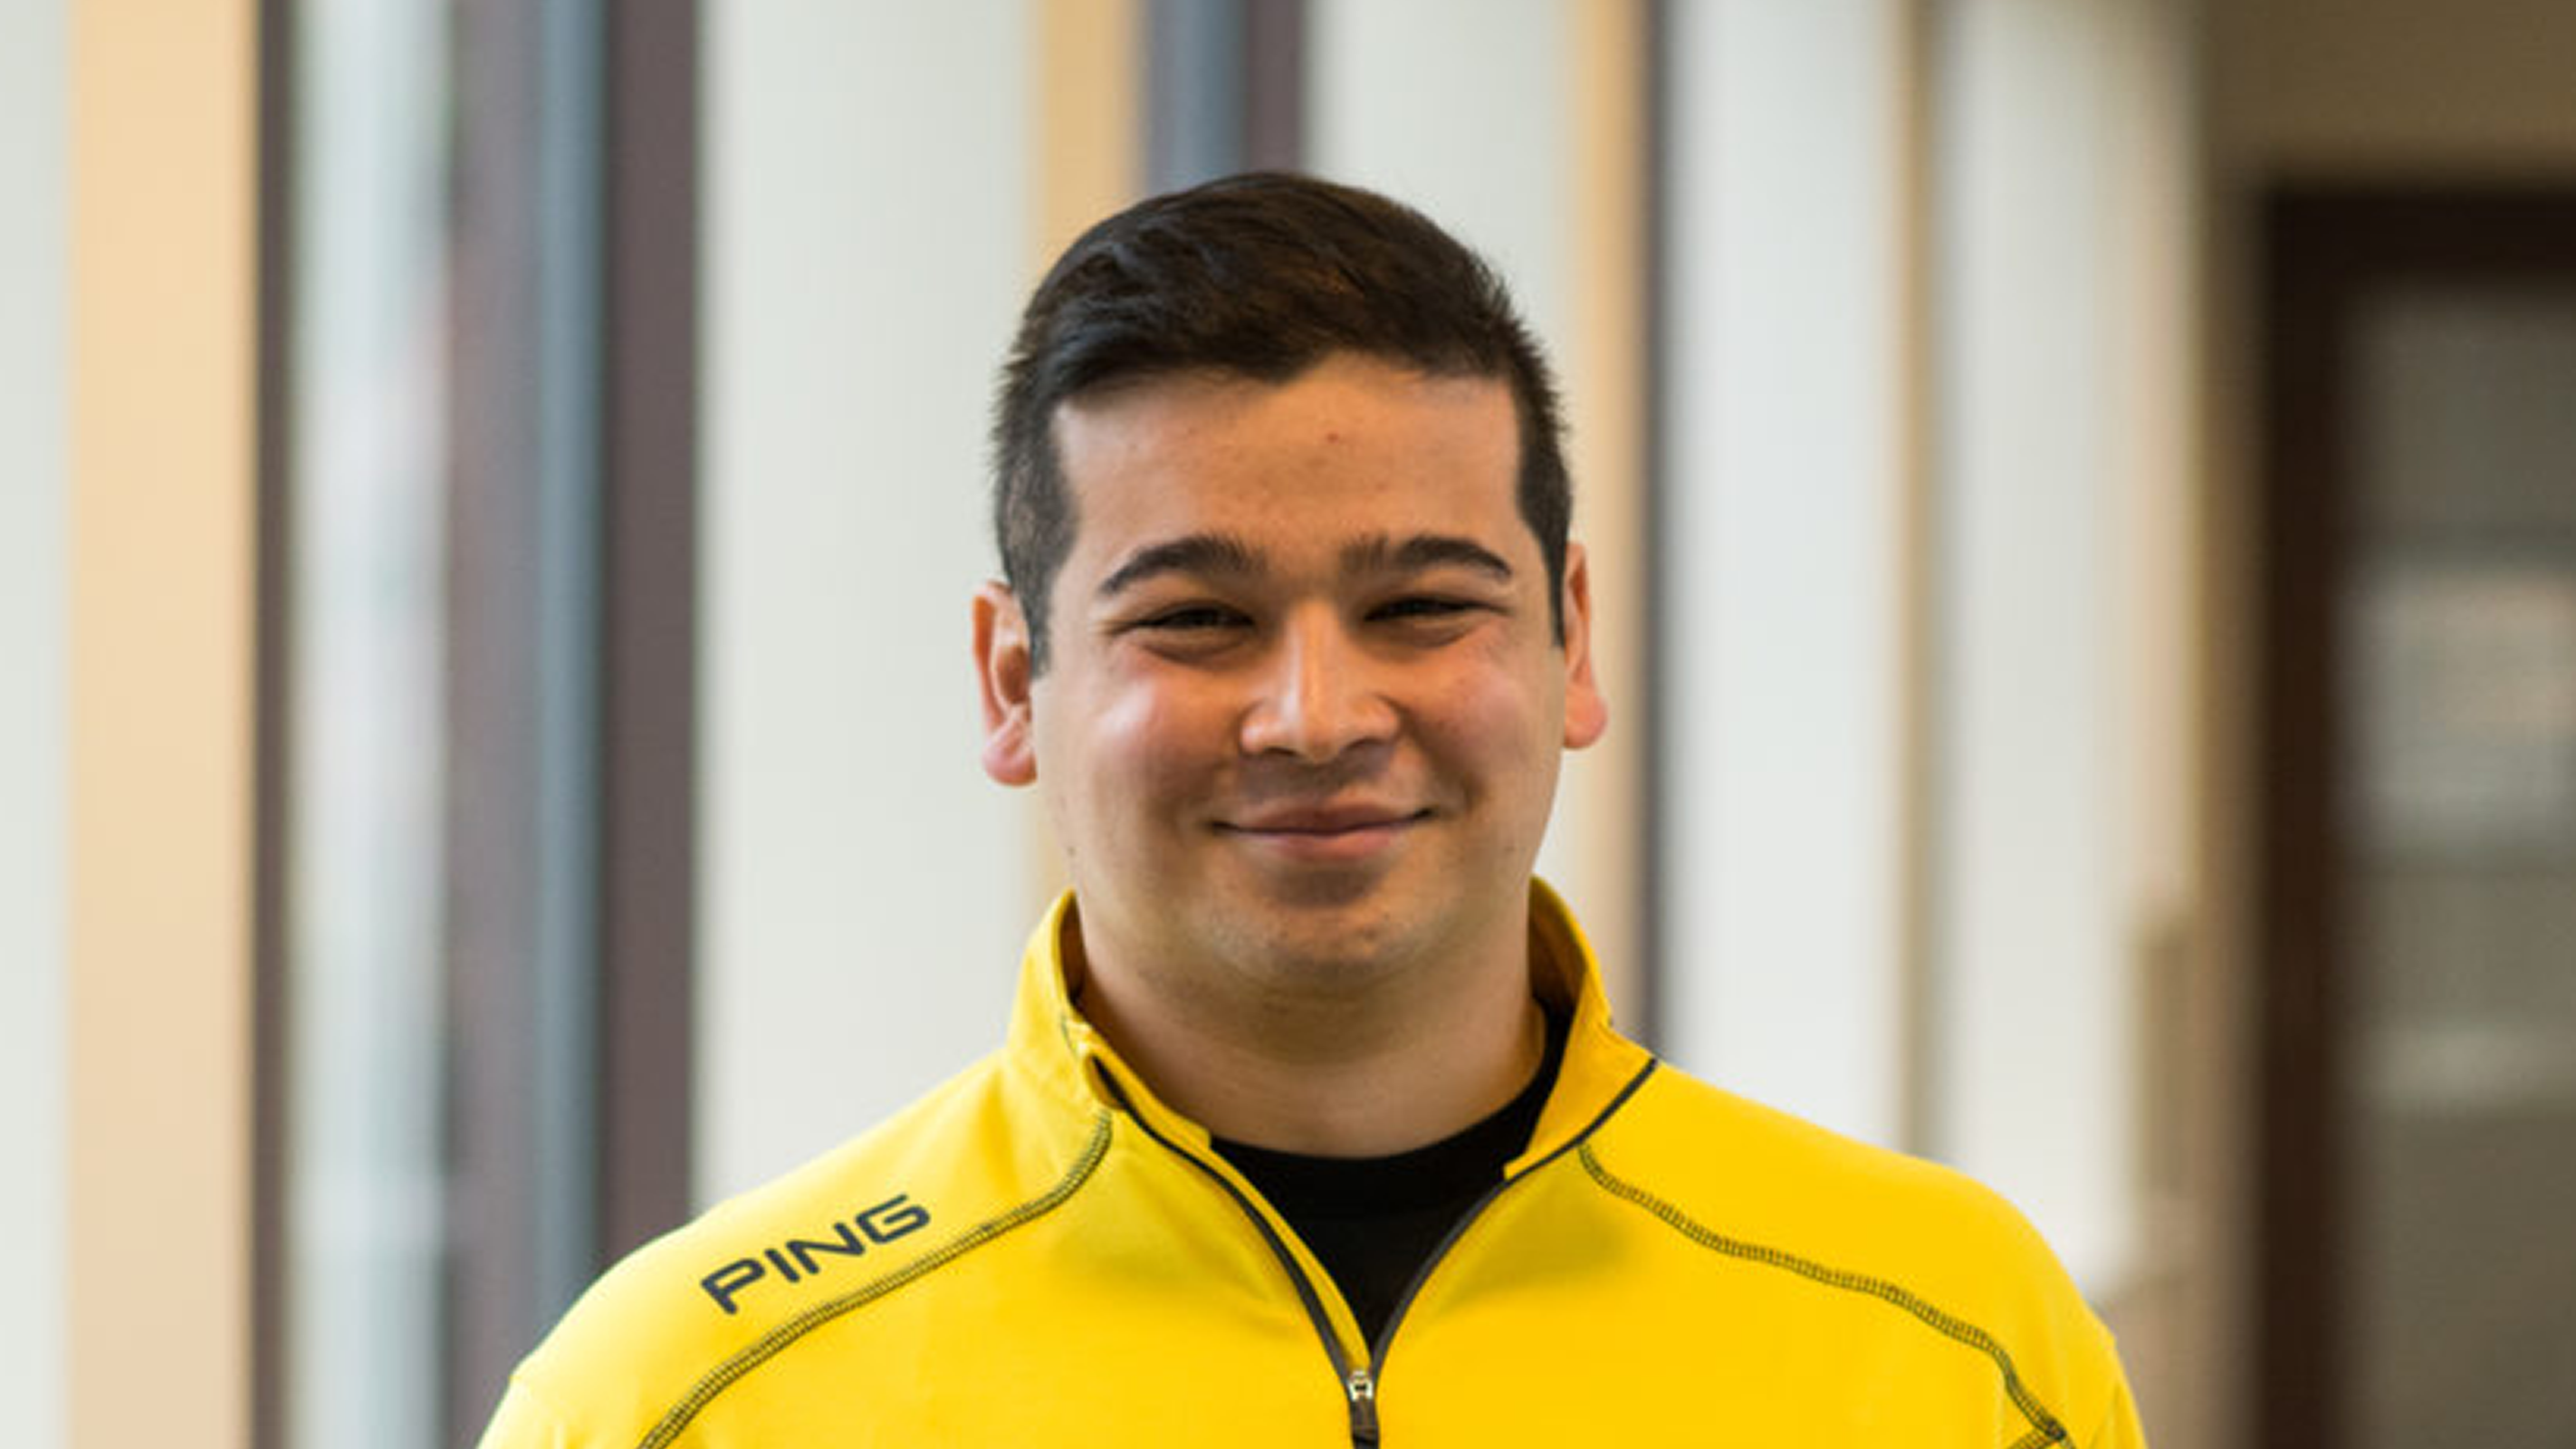 Michael Hua awarded Knoll Graduate Educational Grant from IEEE